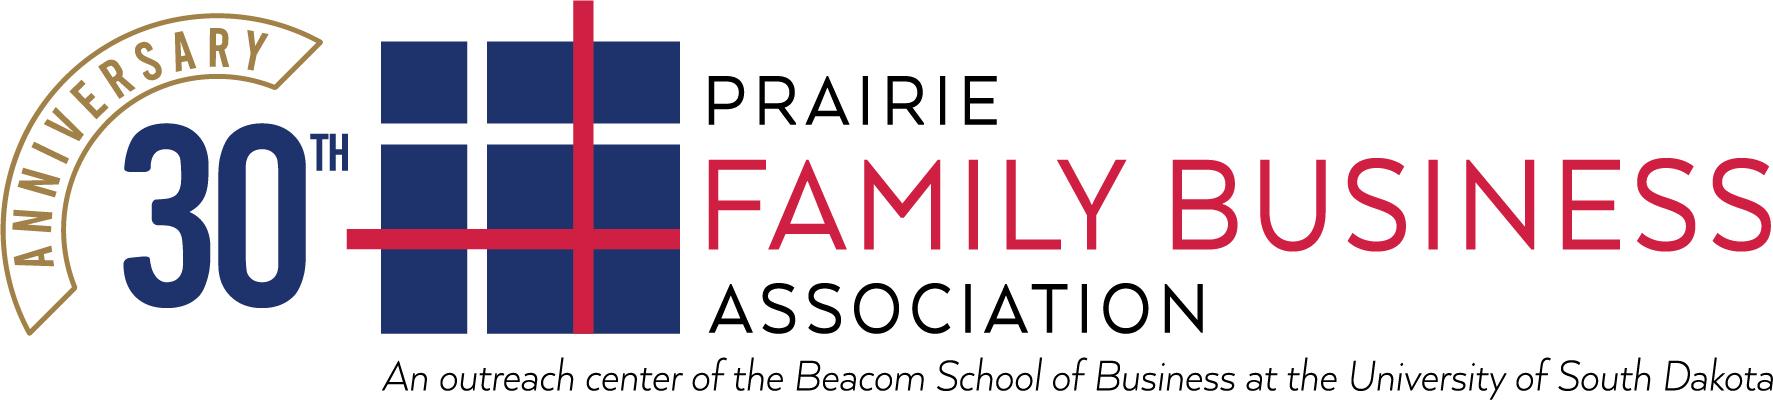 prairie family business 30th anniversary logo